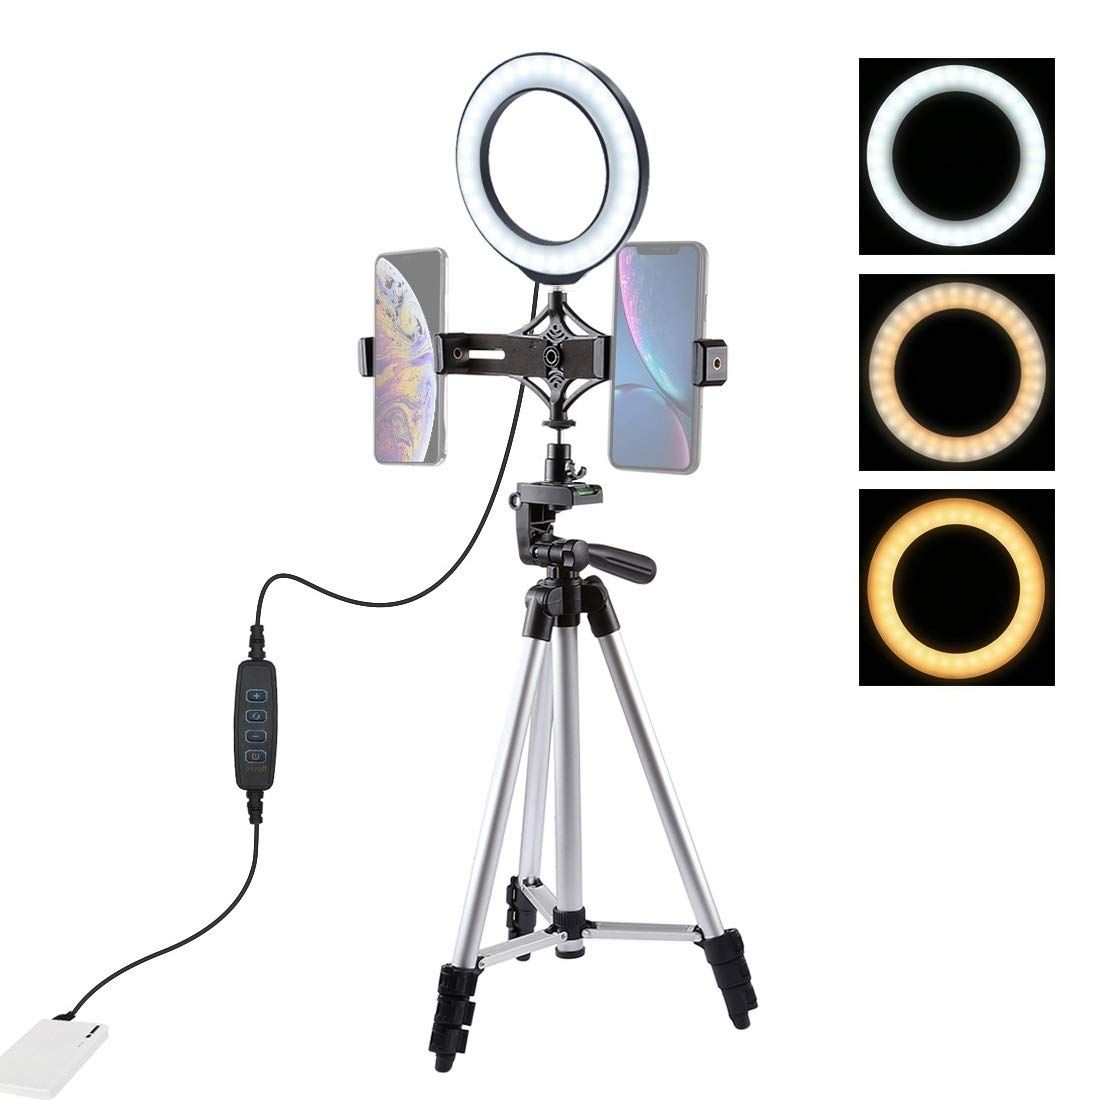 Camera Tripod Mount + Live Broadcast Dual Phone Bracket + 6.2 inch 16cm LED Ring Vlogging Video Light Kits by JUNXI